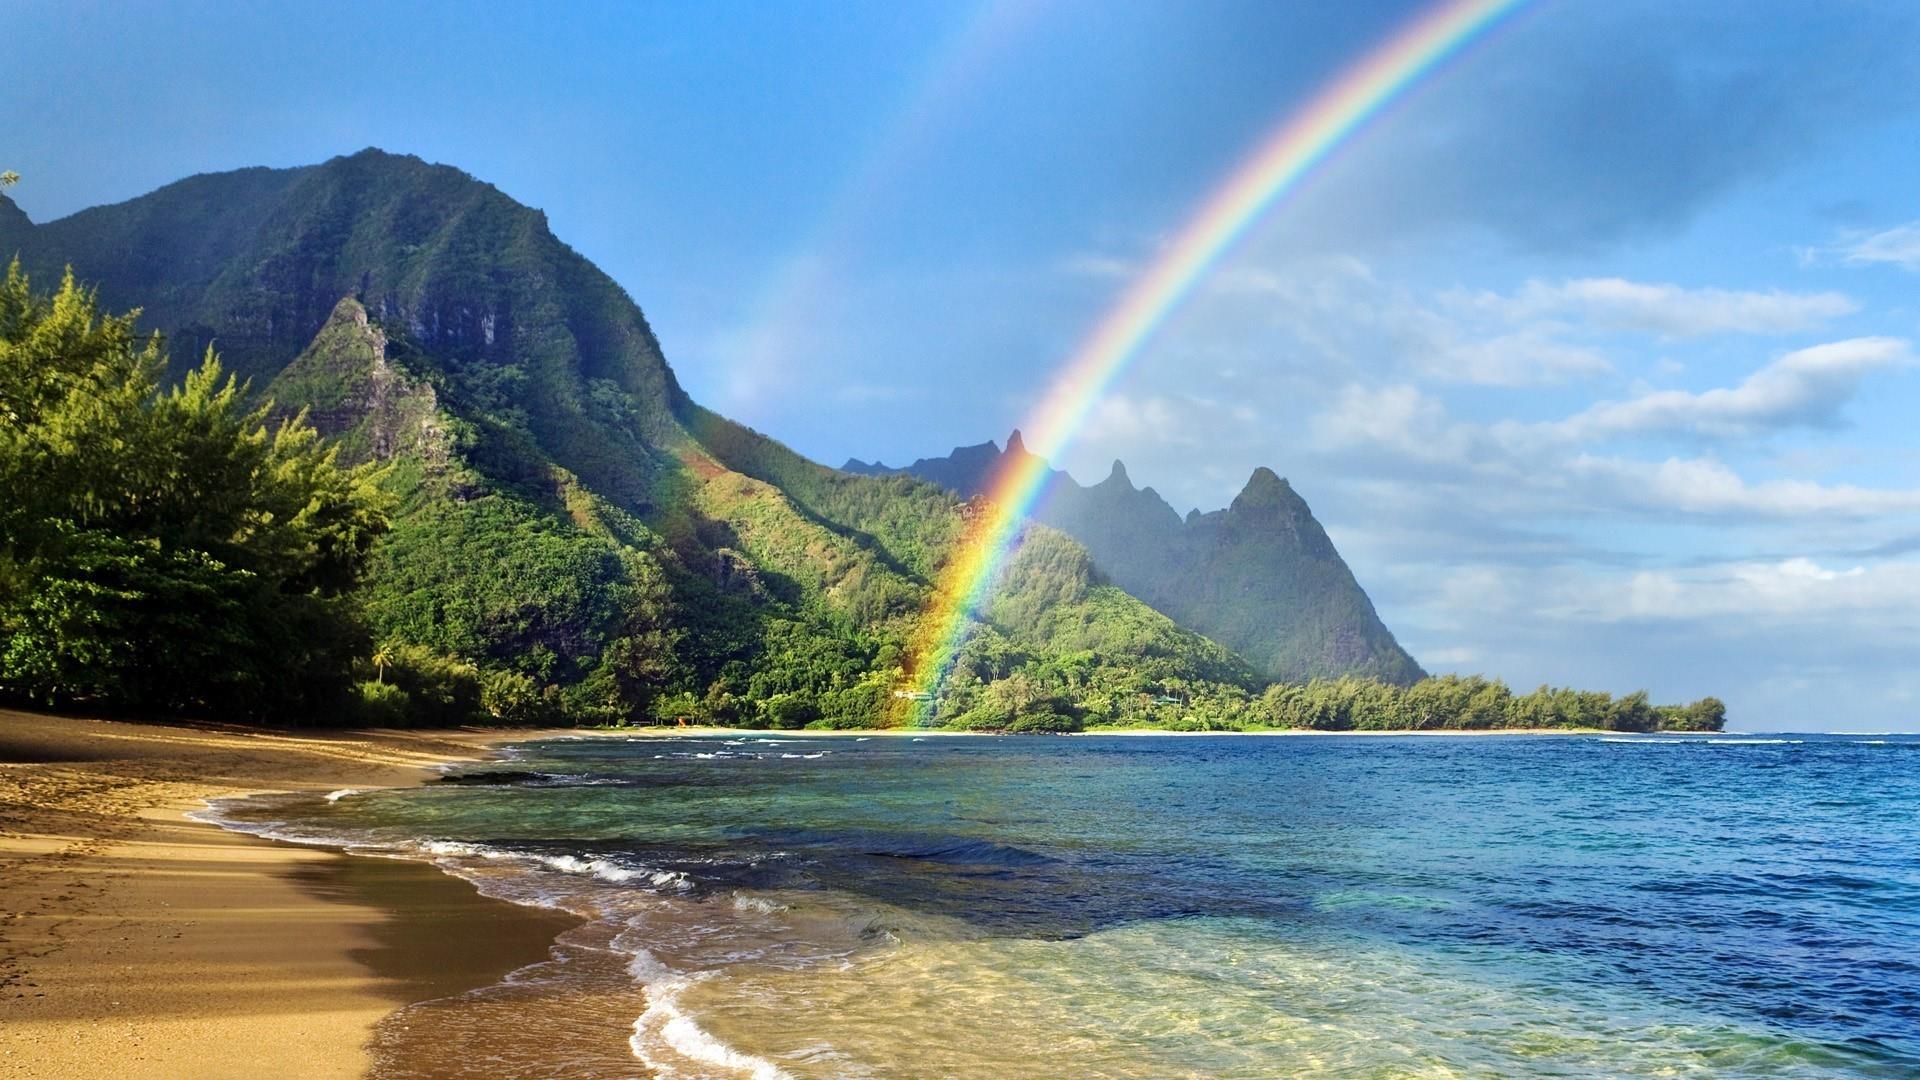 hawaiian beach with rainbow wallpaper | wallpaper studio 10 | tens